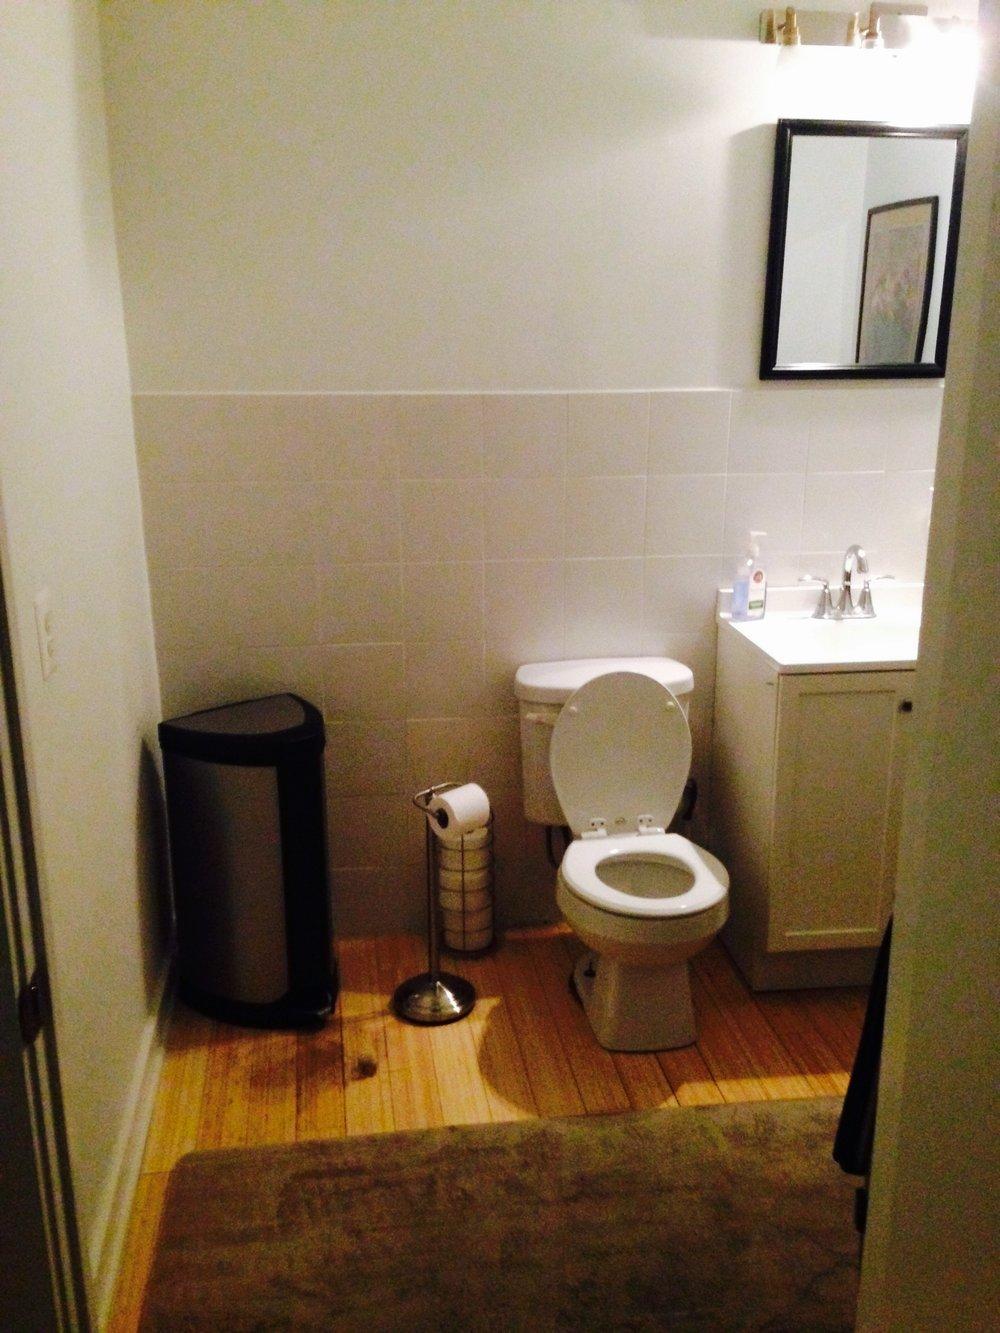 1-LL-Bathroom-Before.jpg